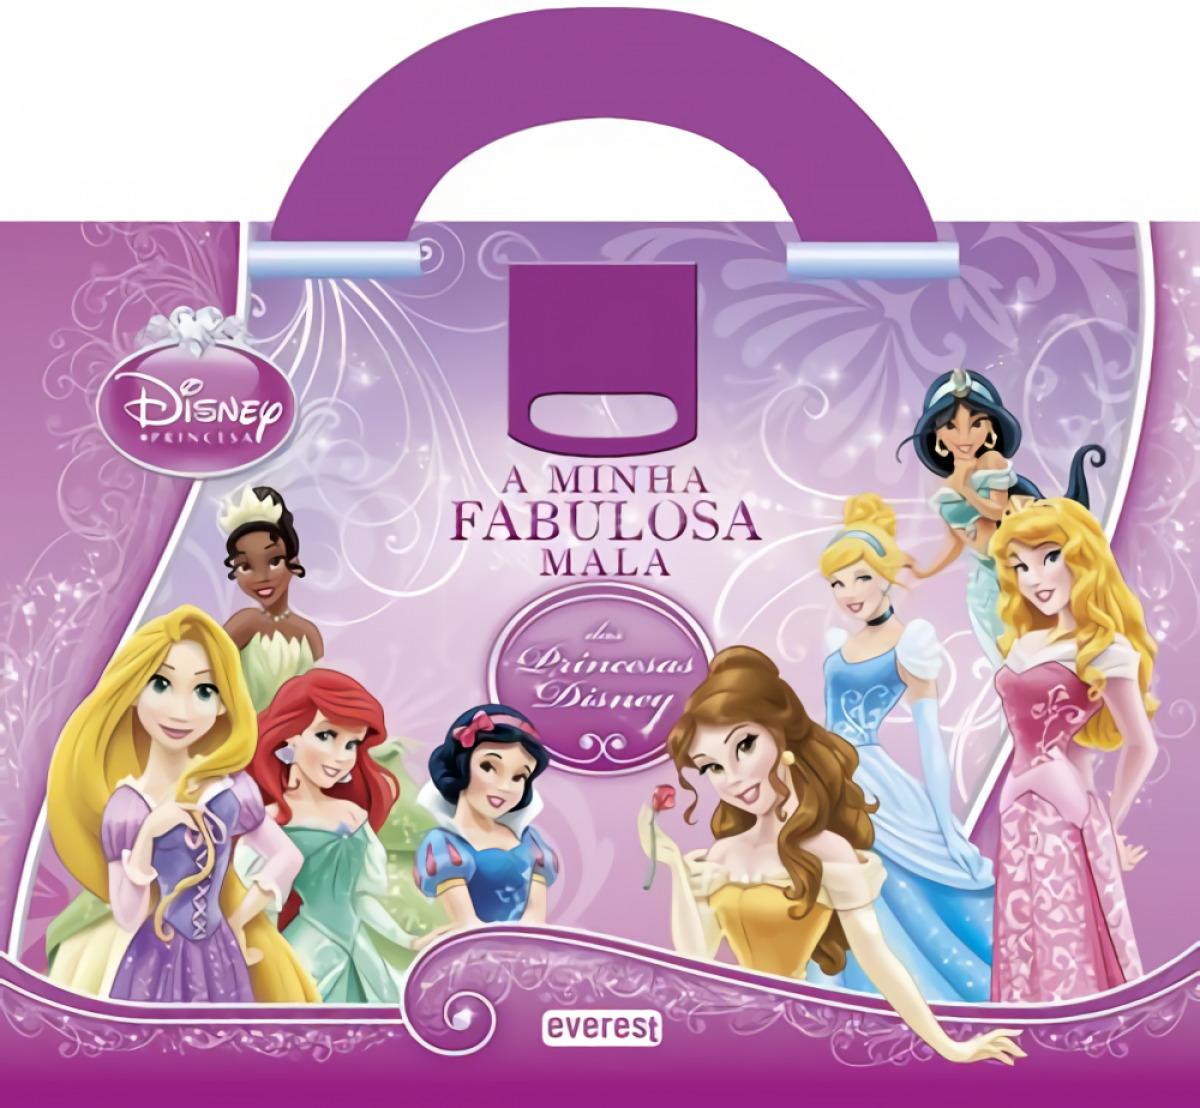 A minha fabulosa mala das princesas disney - Vv.Aa.